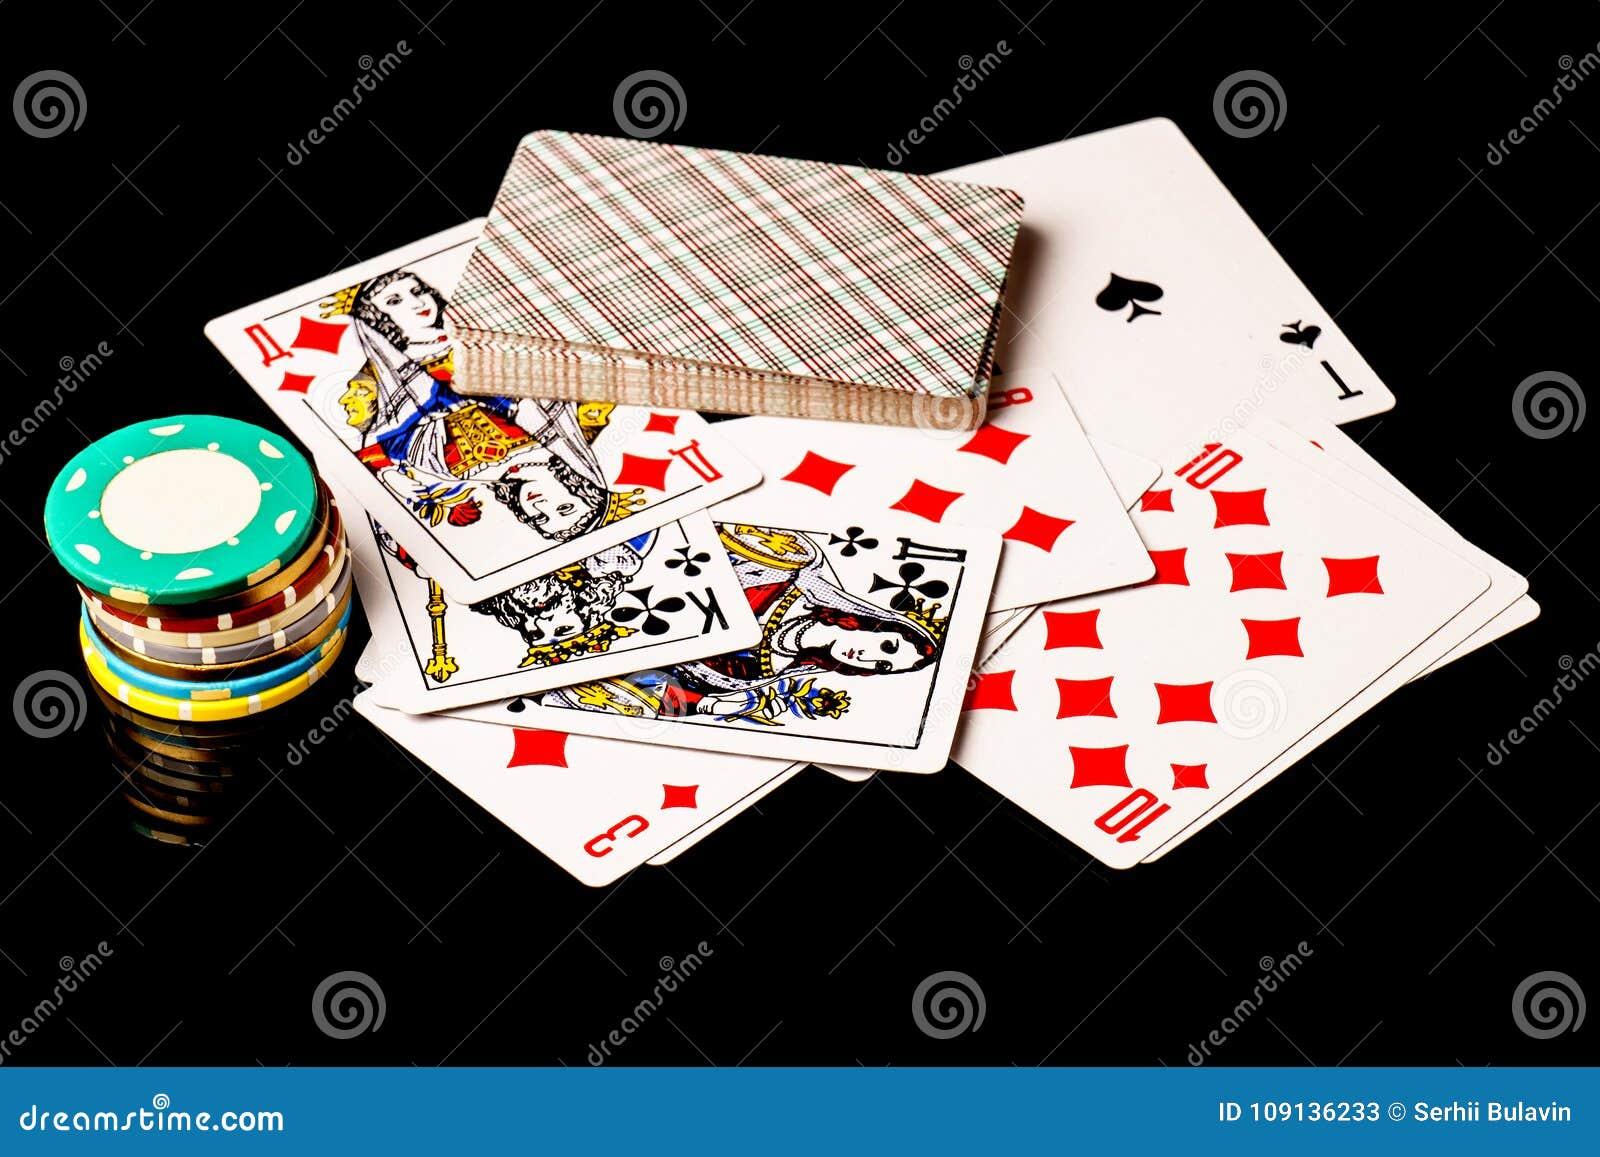 Online casino no deposit free bonus